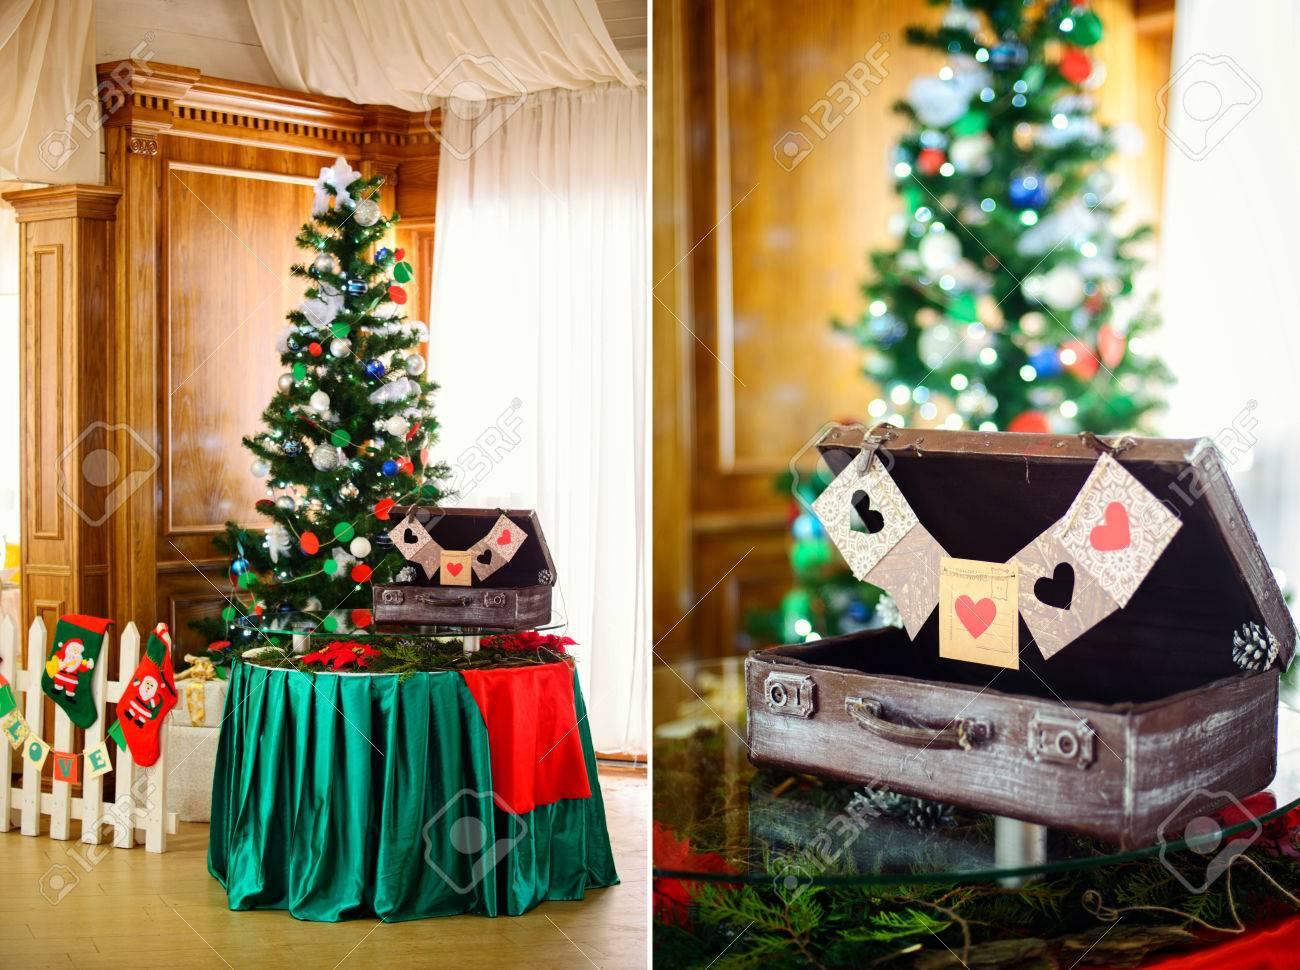 Christmas decorations christmas tree and suitcase on the table christmas decorations christmas tree and suitcase on the table for a winter wedding stock junglespirit Gallery